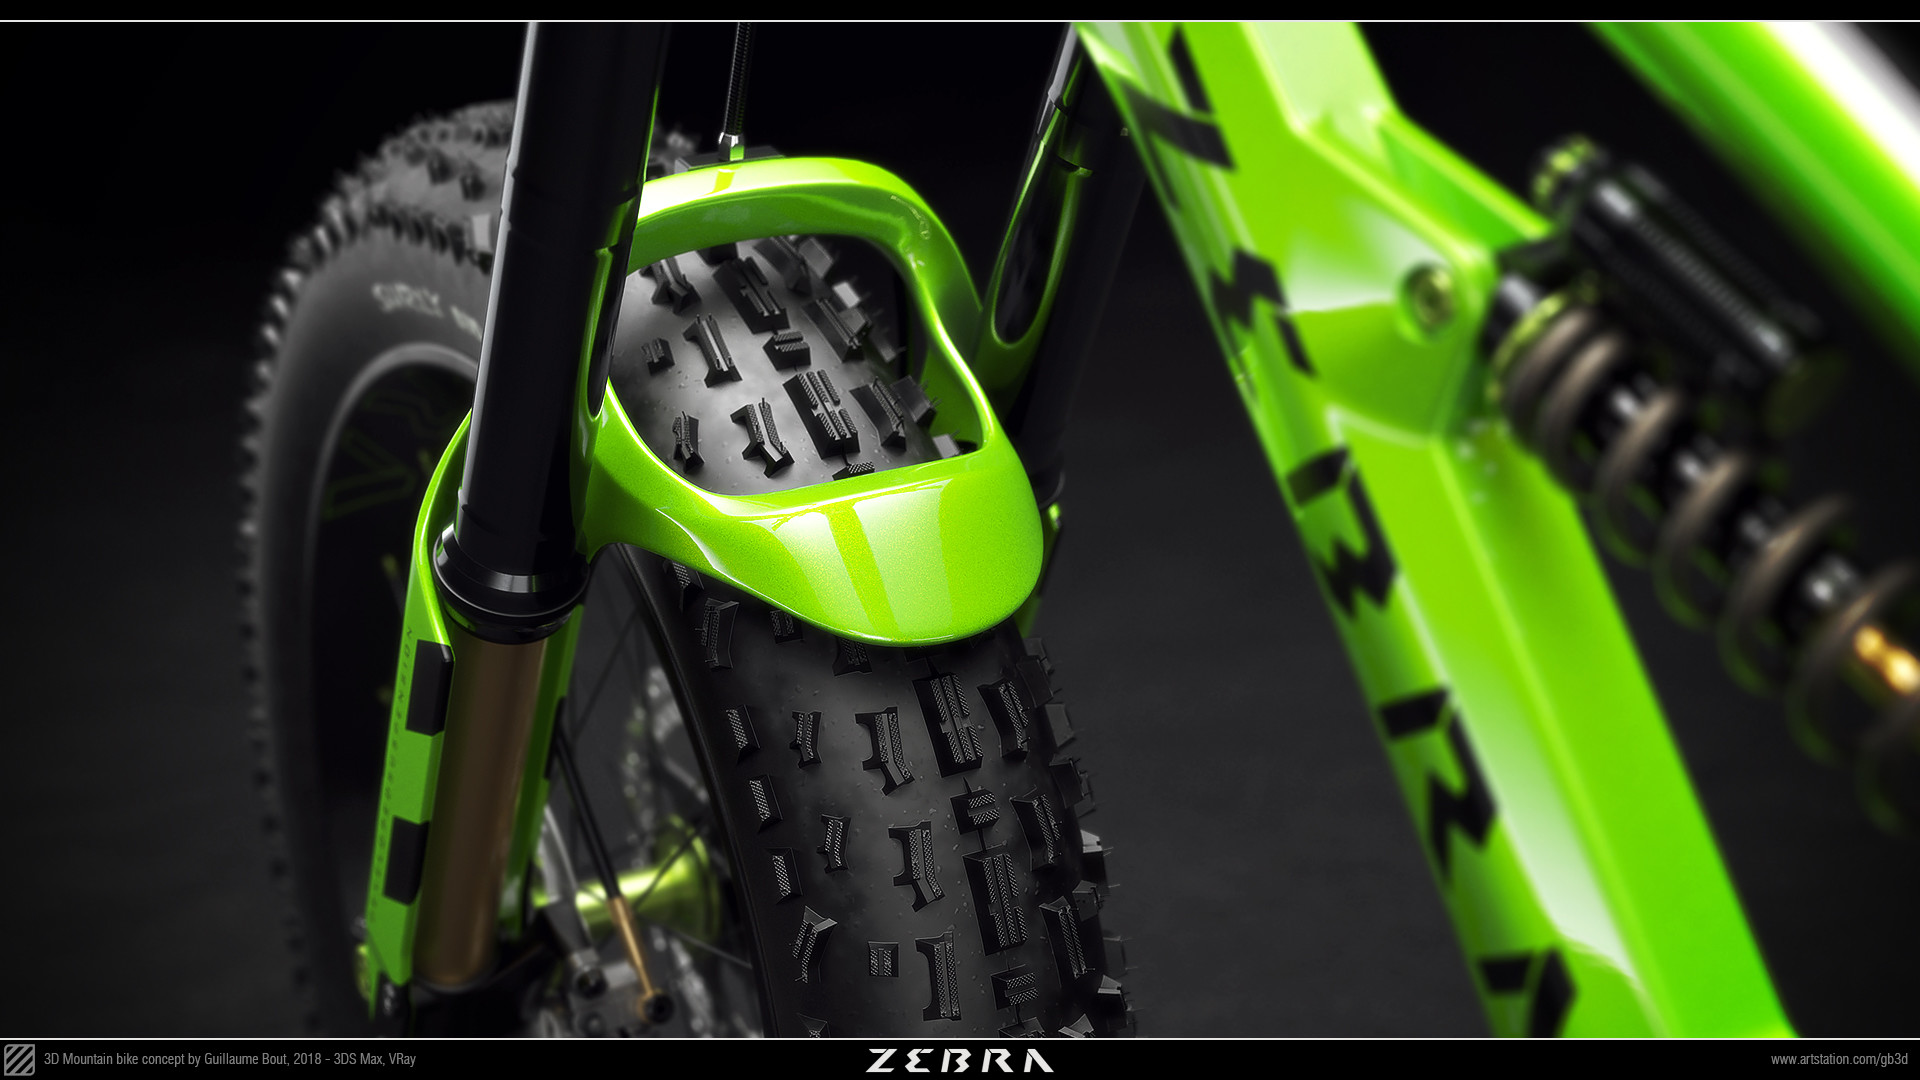 guillaume-bout-fx-green-arche-fourche-loin.jpg